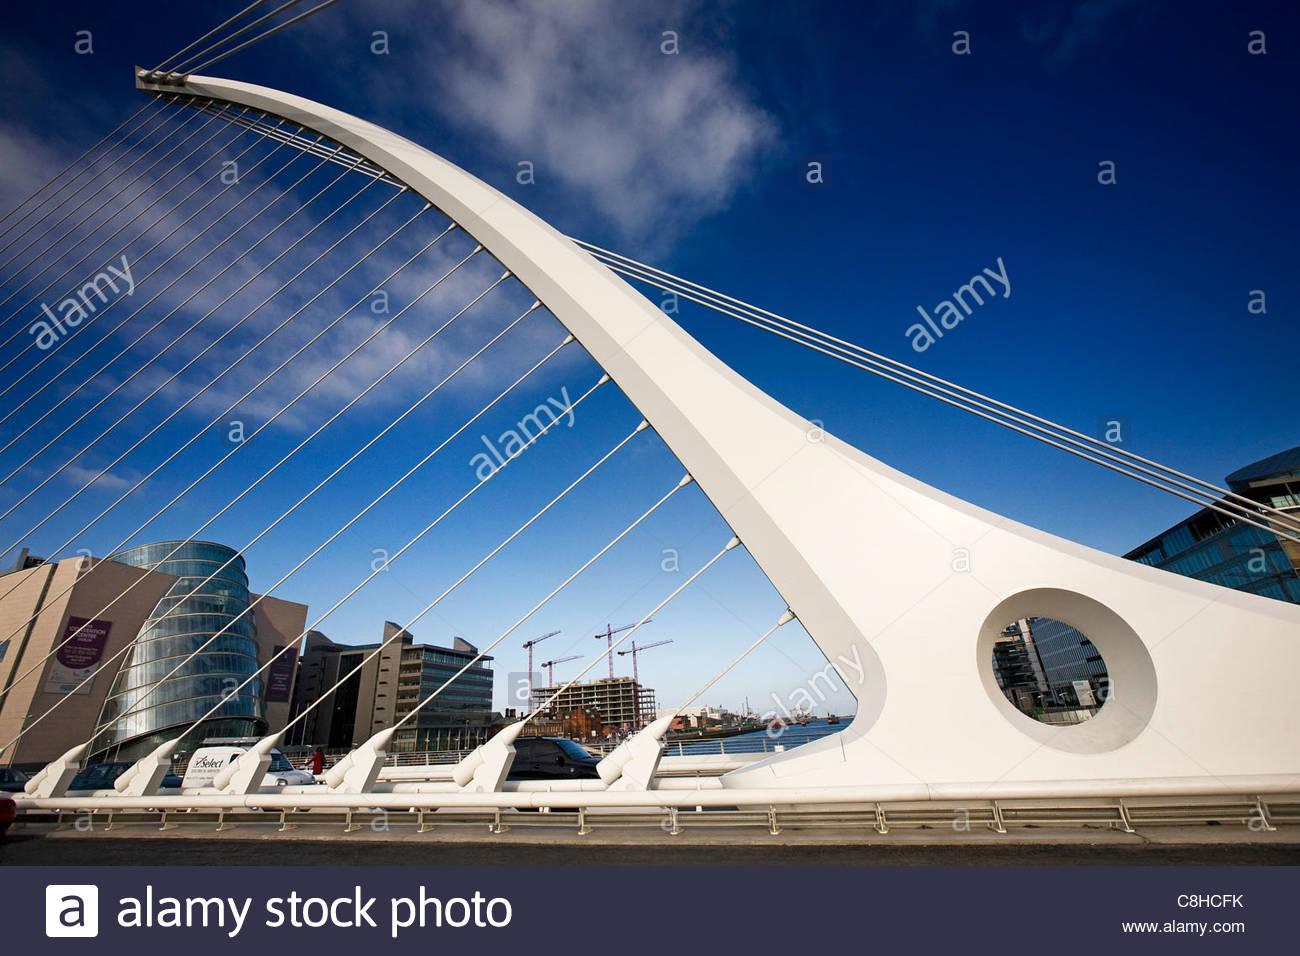 Samuel Beckett Bridge spanning the River Liffey in Dublin's docklands. - Stock Image